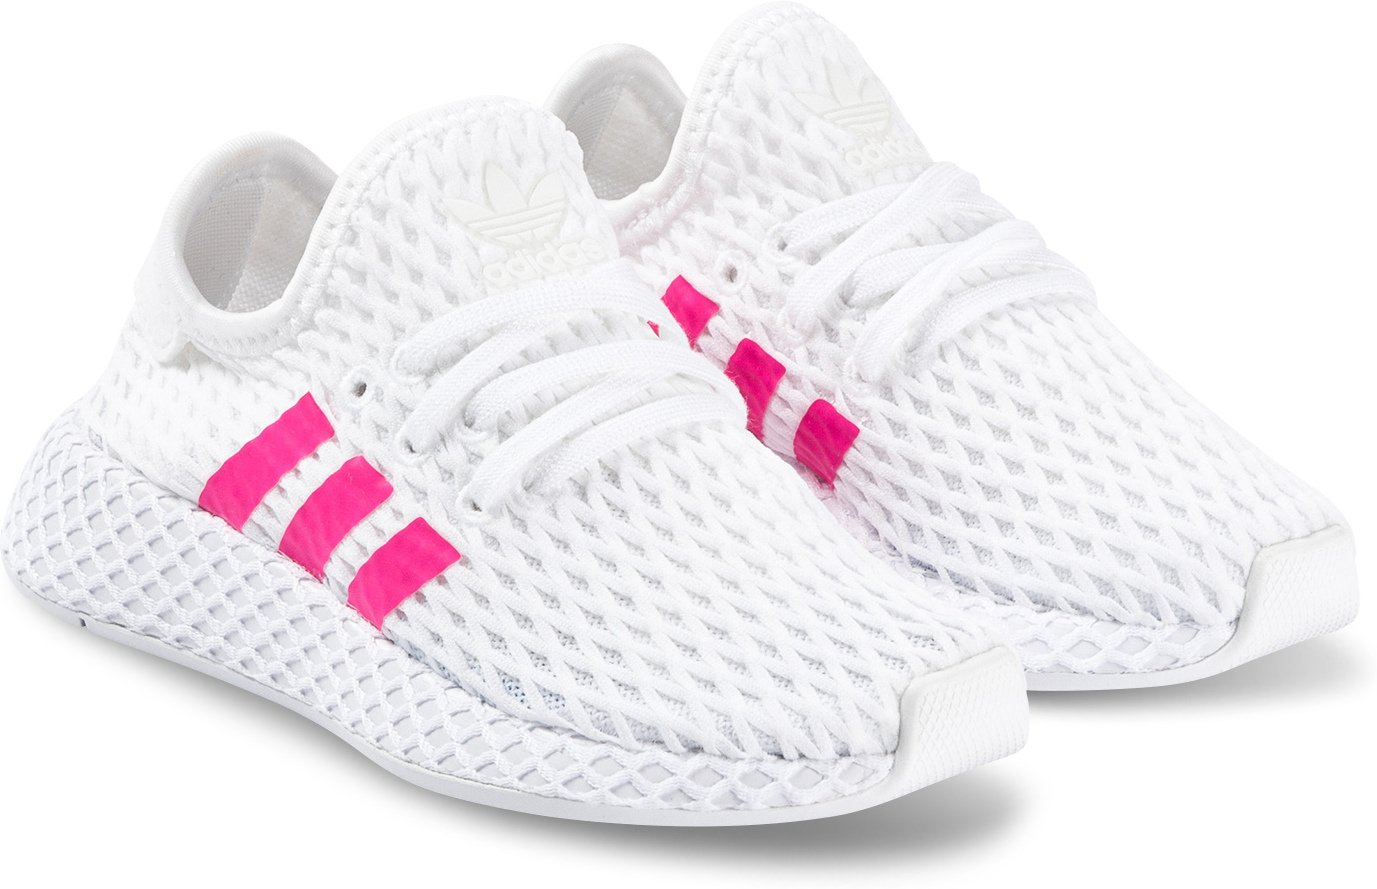 Adidas Originals Deerupt Runner (Barnjunior)